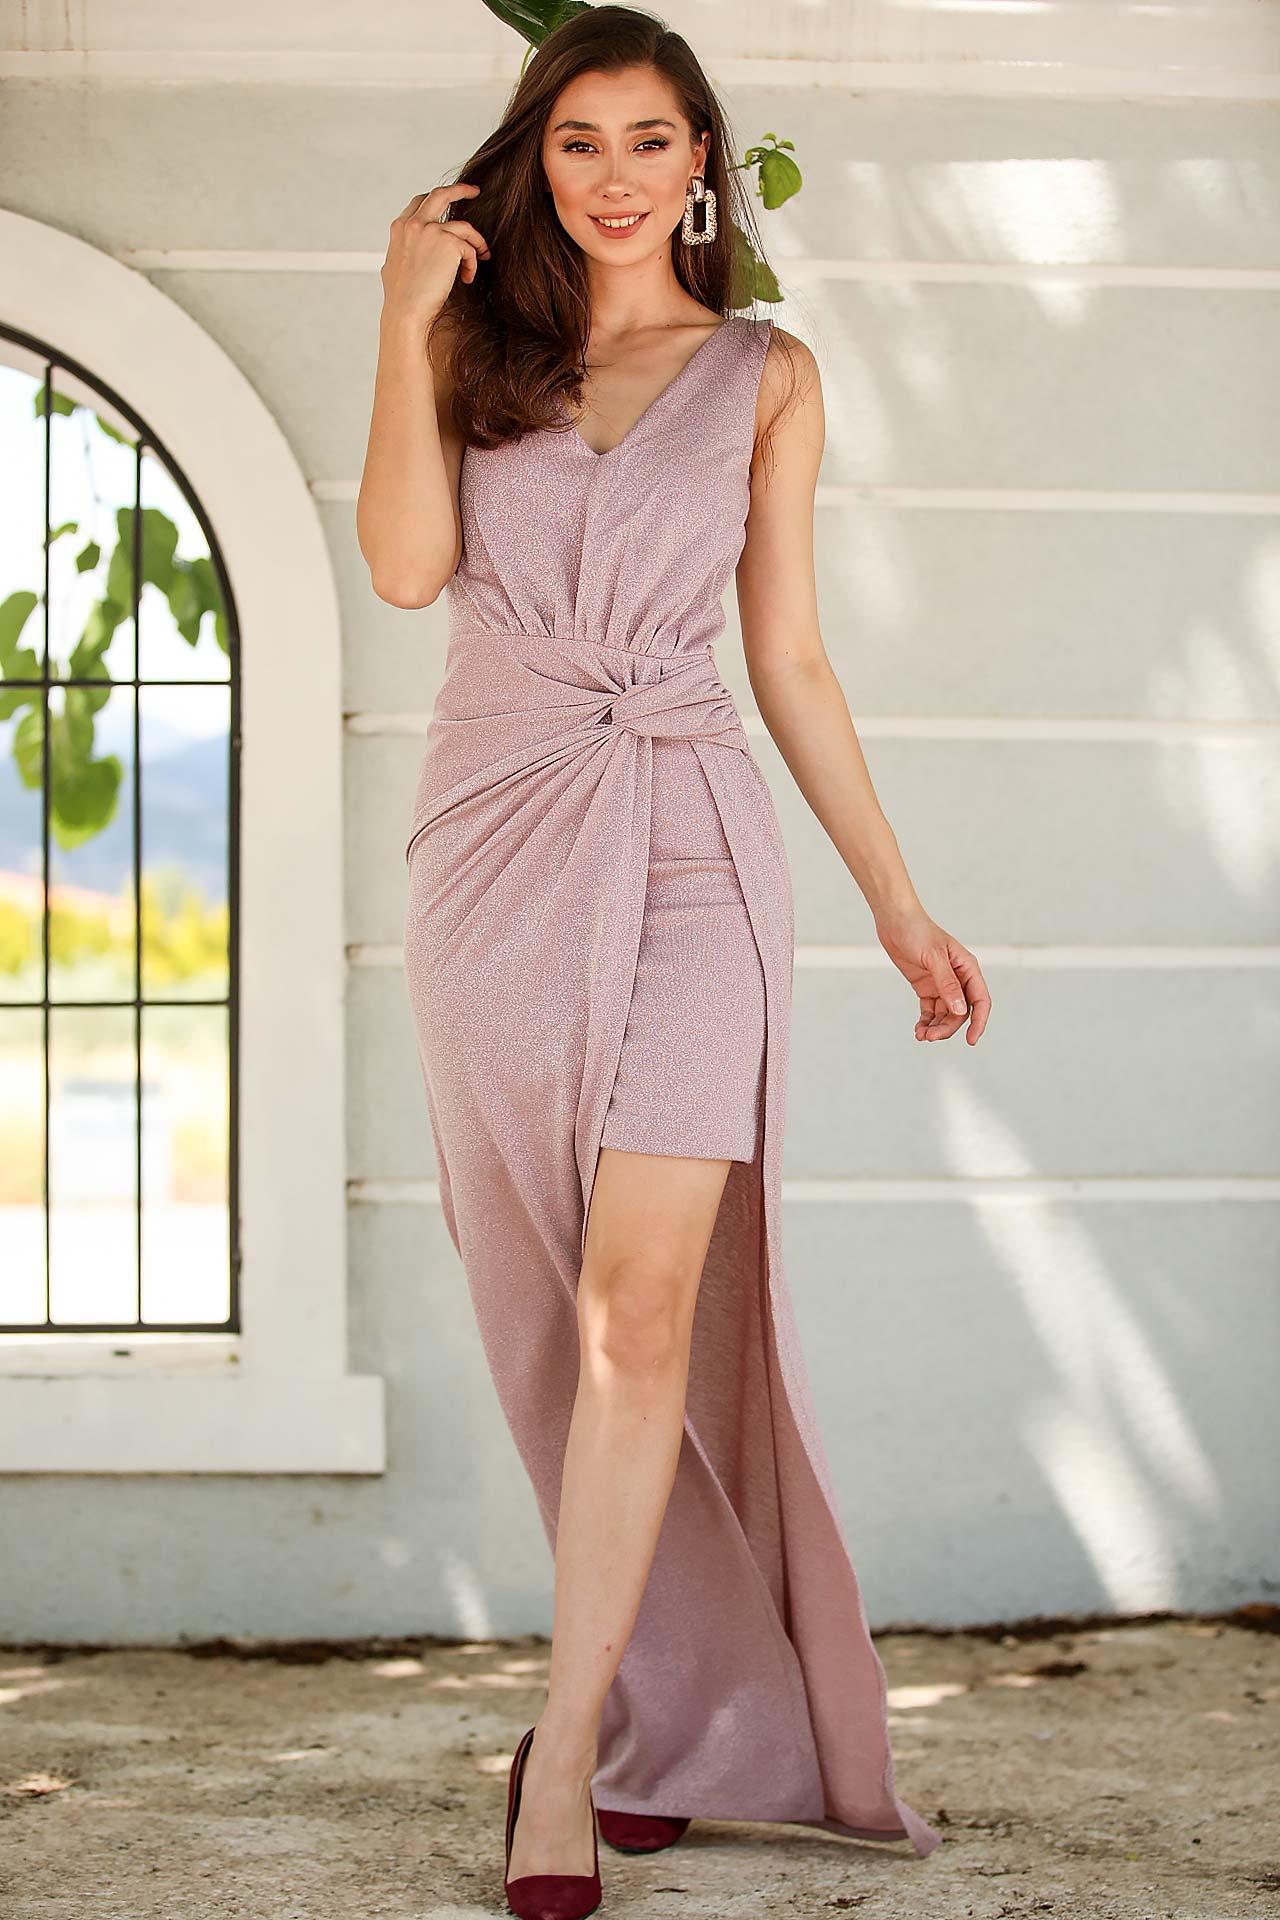 Women's Shiny Dusty Rose Evening Dress